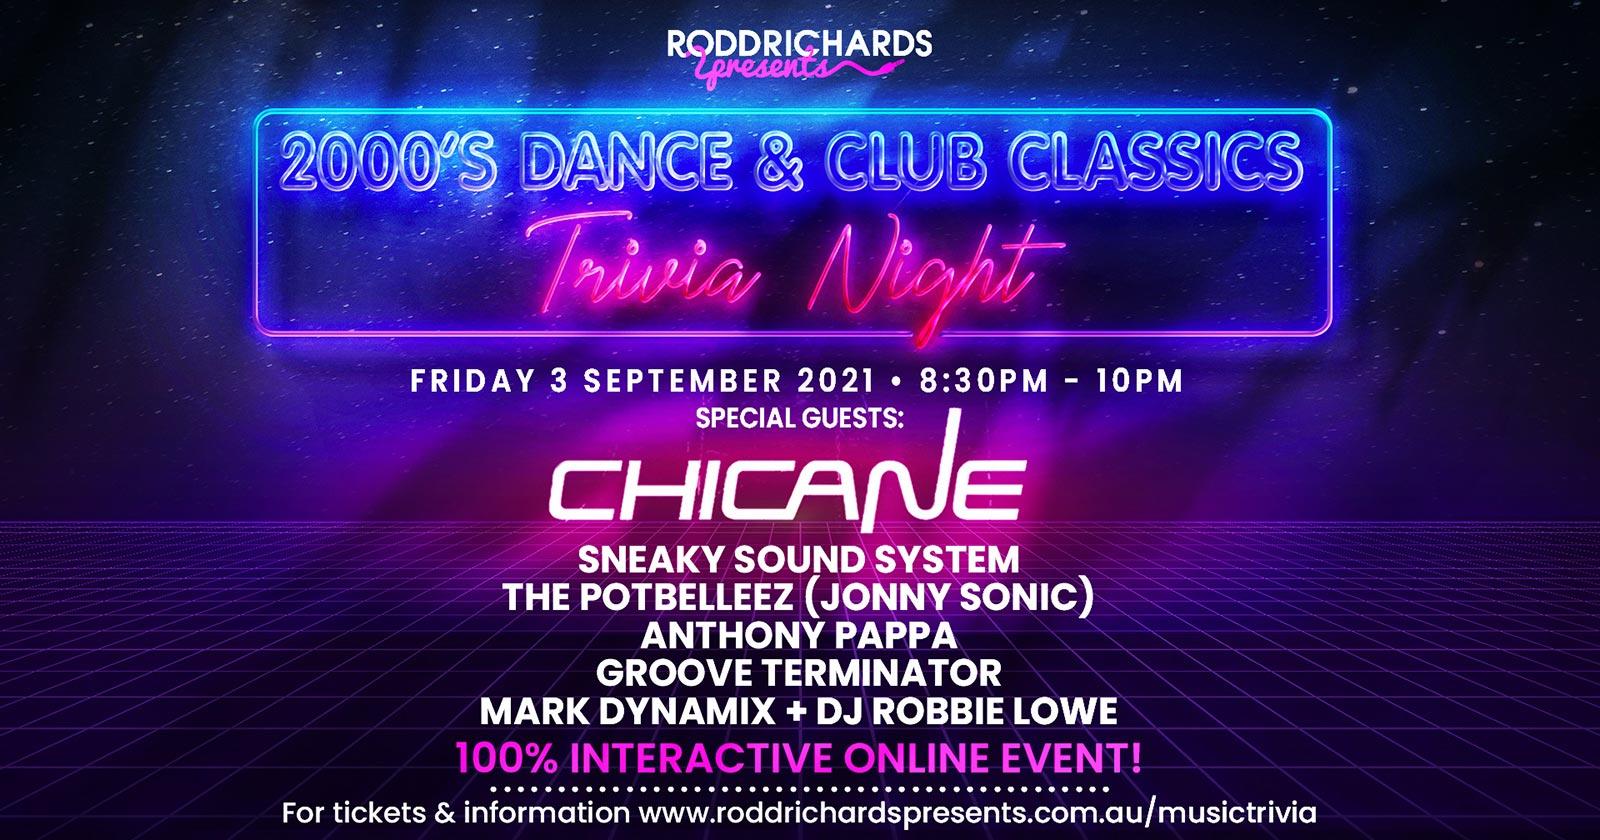 rodd-richards-presents-2000s-dance-club-classics-trivia-night-oz-edm